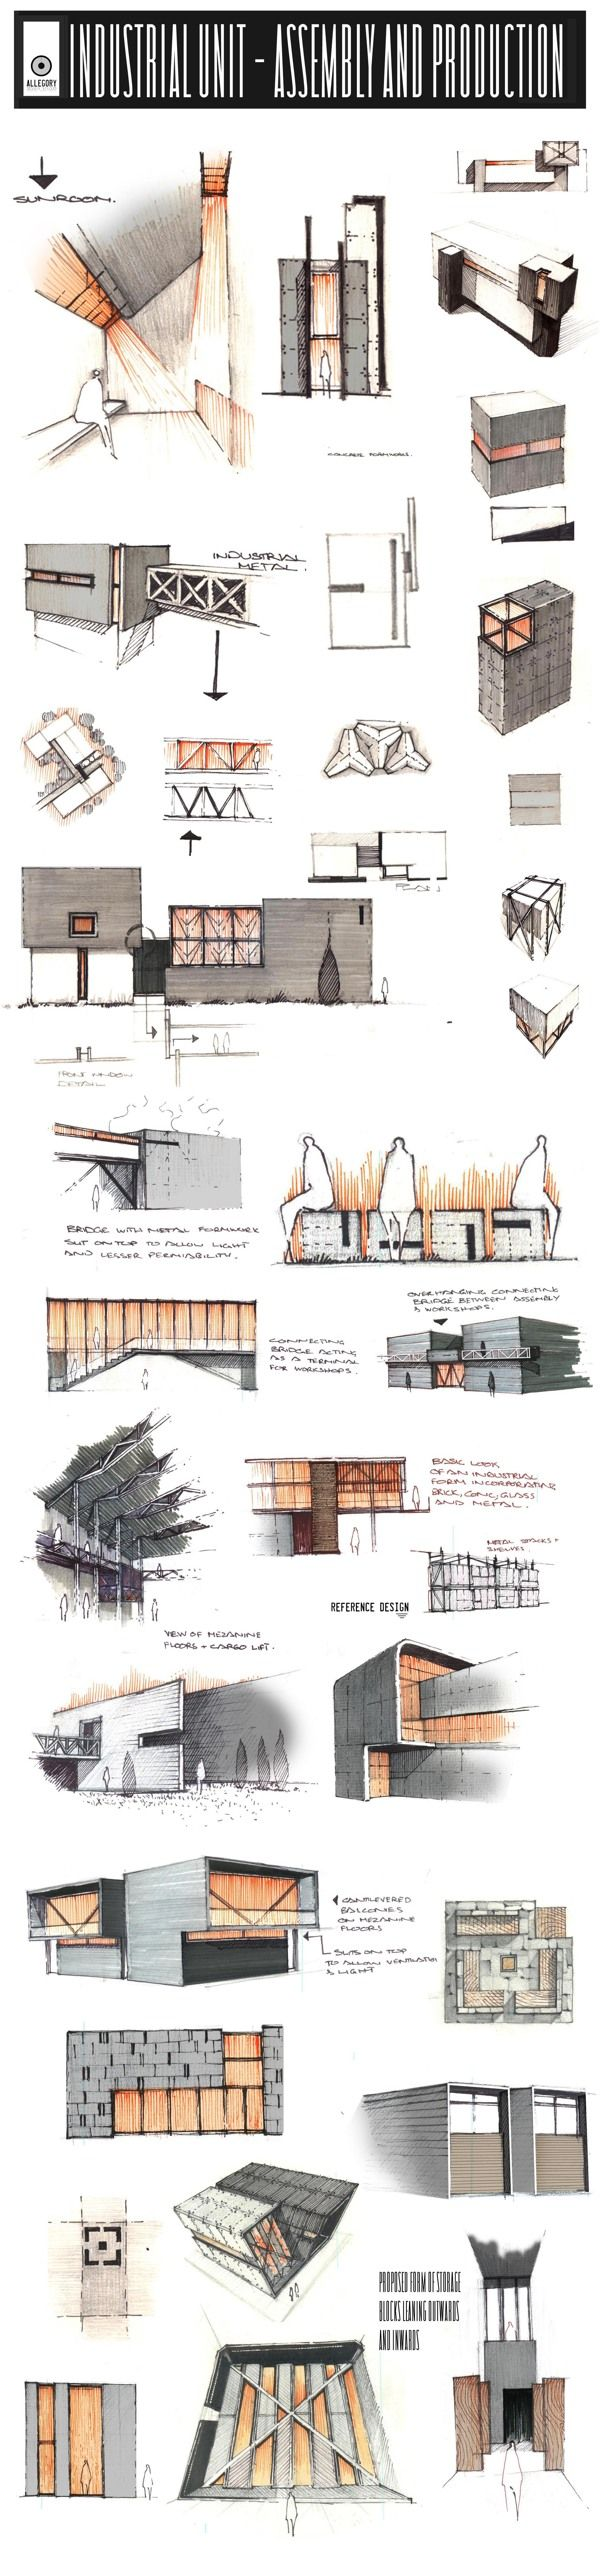 https://www.behance.net/gallery/8571021/Professional-Design-Proposals-Under-Development